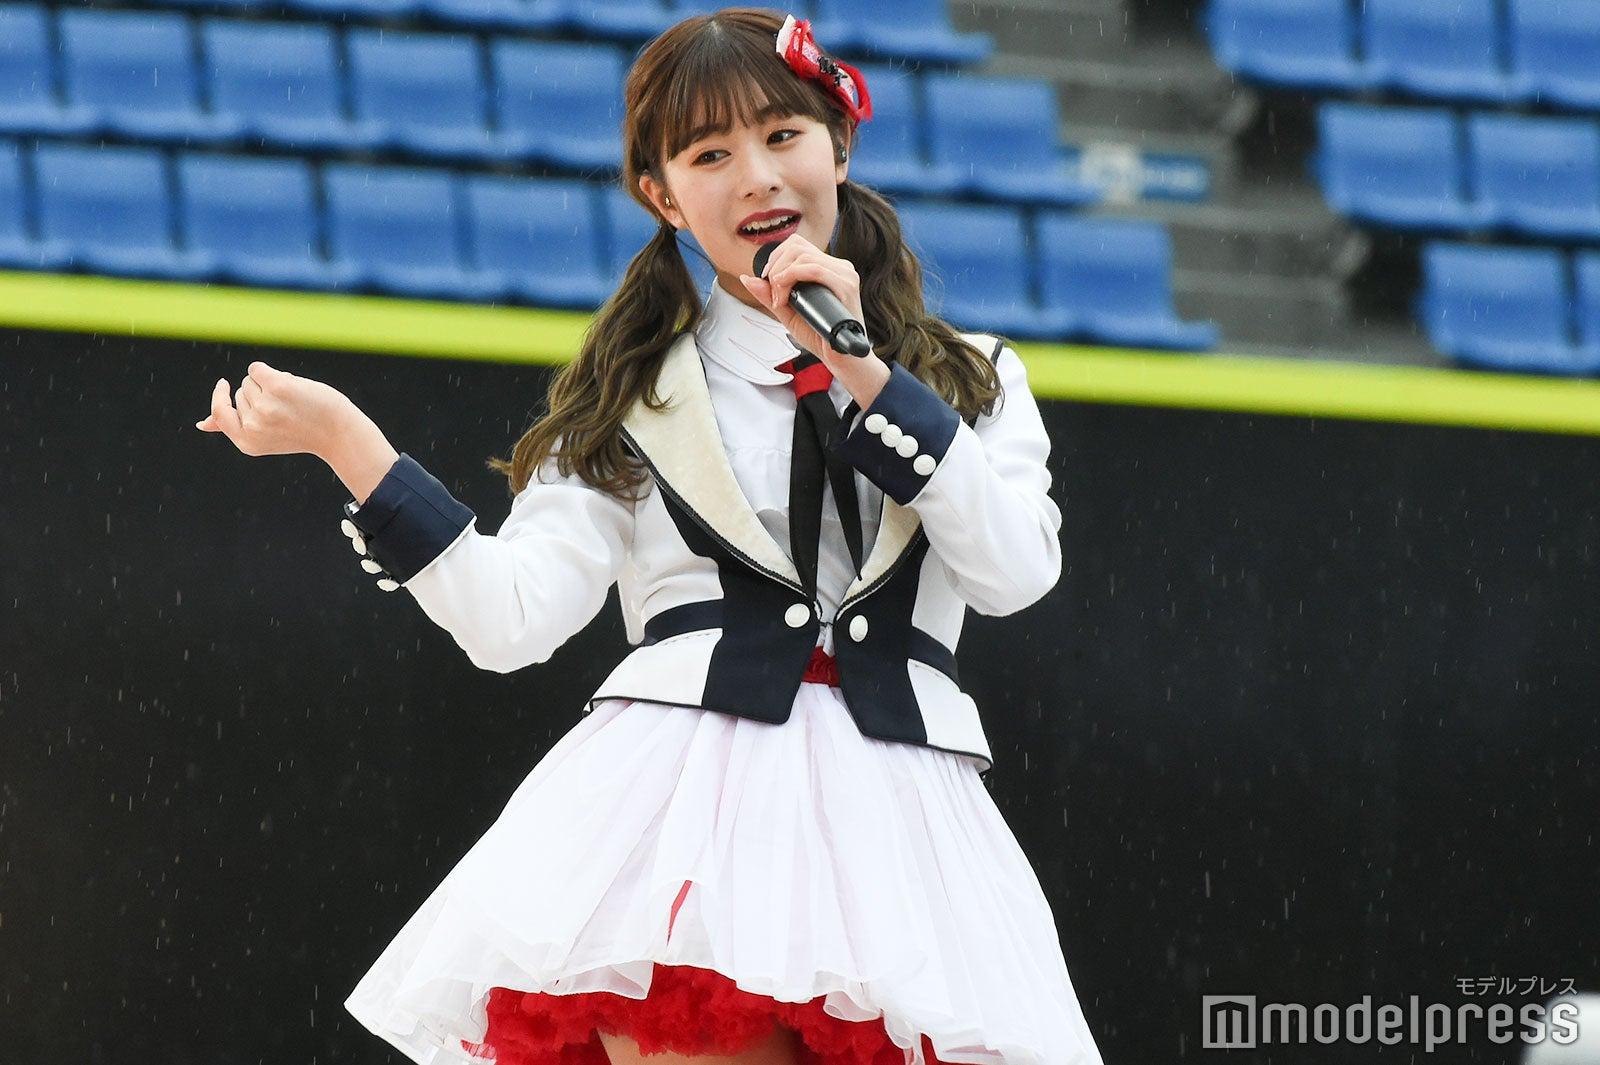 【NGT48】加藤美南応援スレ☆46【かとみな】 YouTube動画>11本 ->画像>415枚